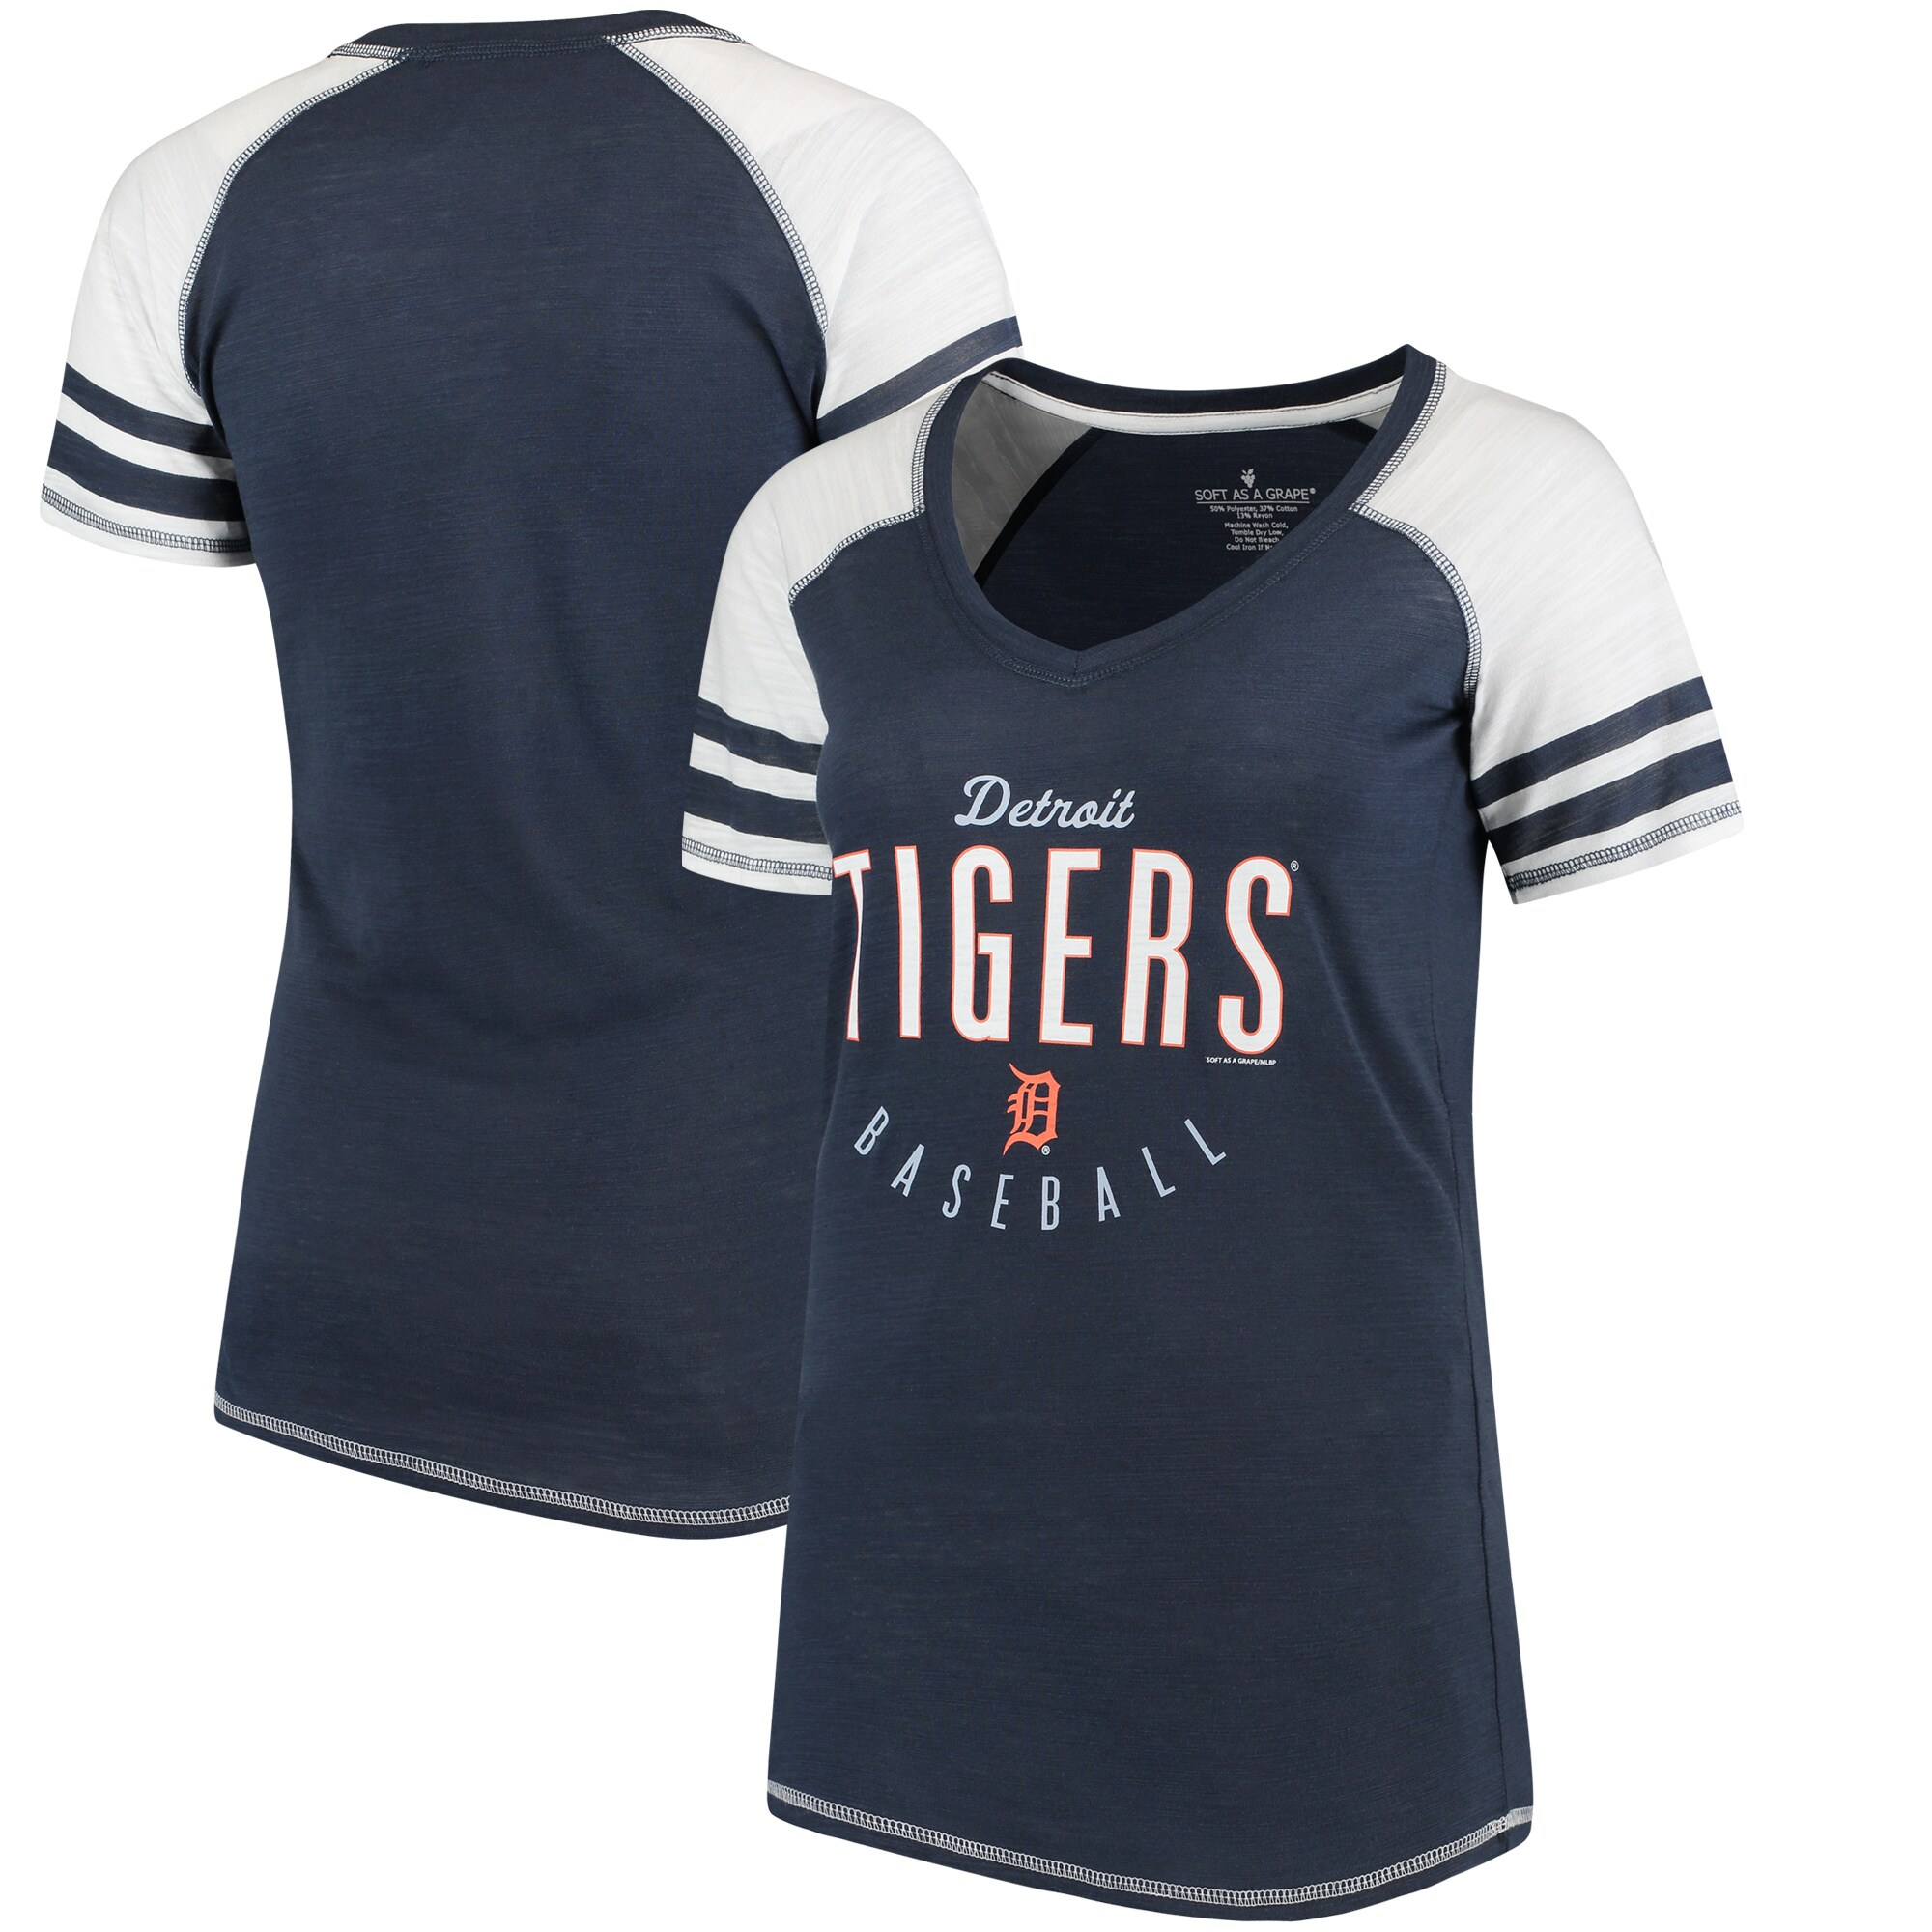 Detroit Tigers Soft As A Grape Women's Down the Line Color Blocked Tri-Blend V-Neck Raglan Sleeve T-Shirt - Navy